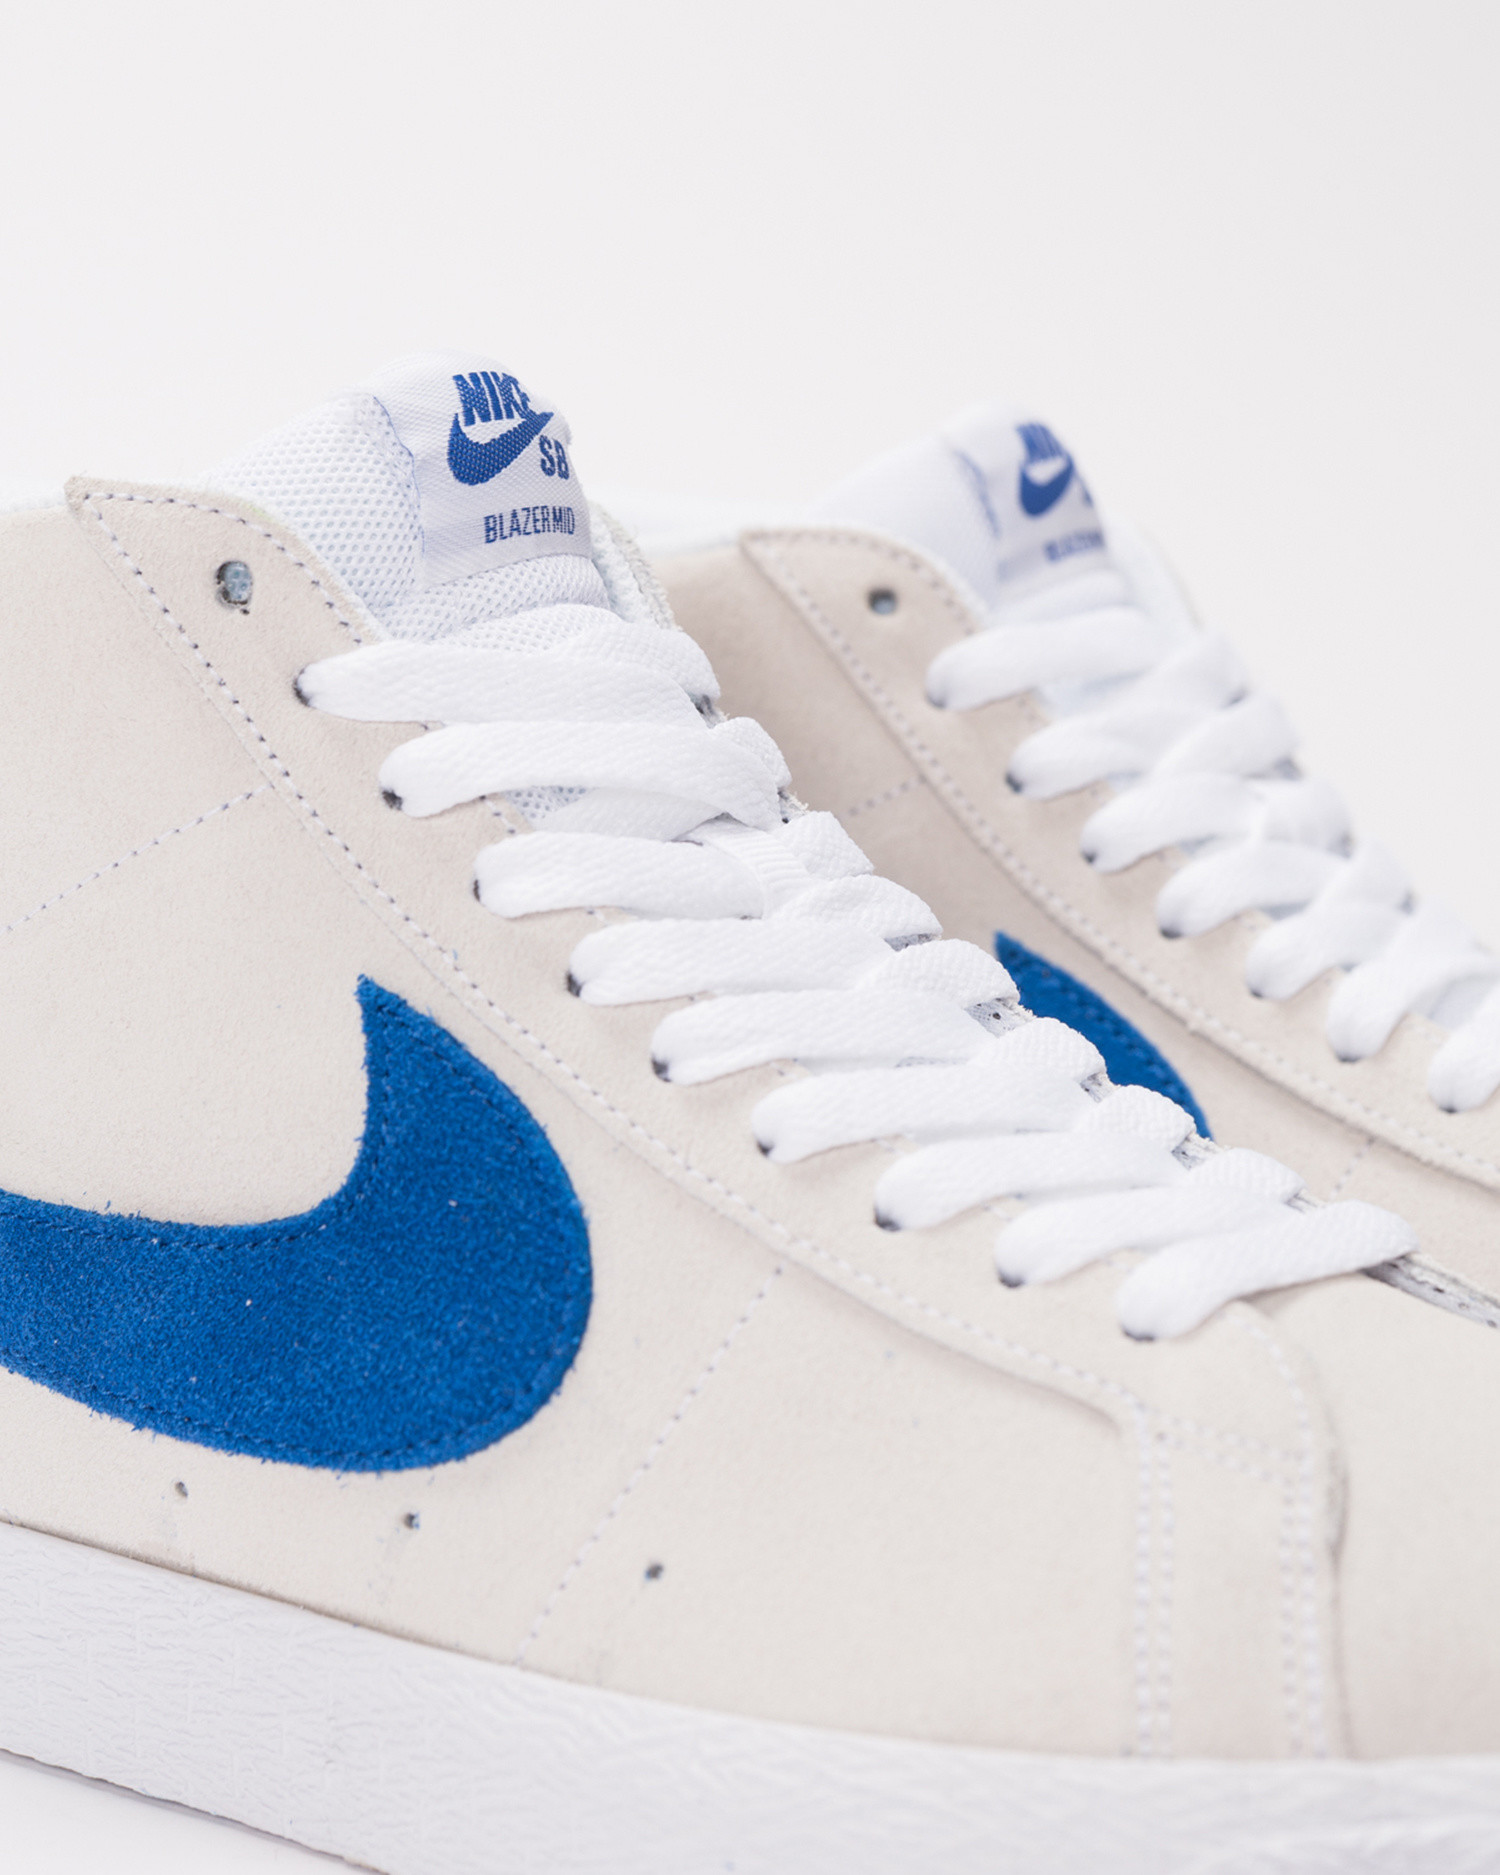 Nike SB Zoom Blazer Mid White/team royal-white-cerulean